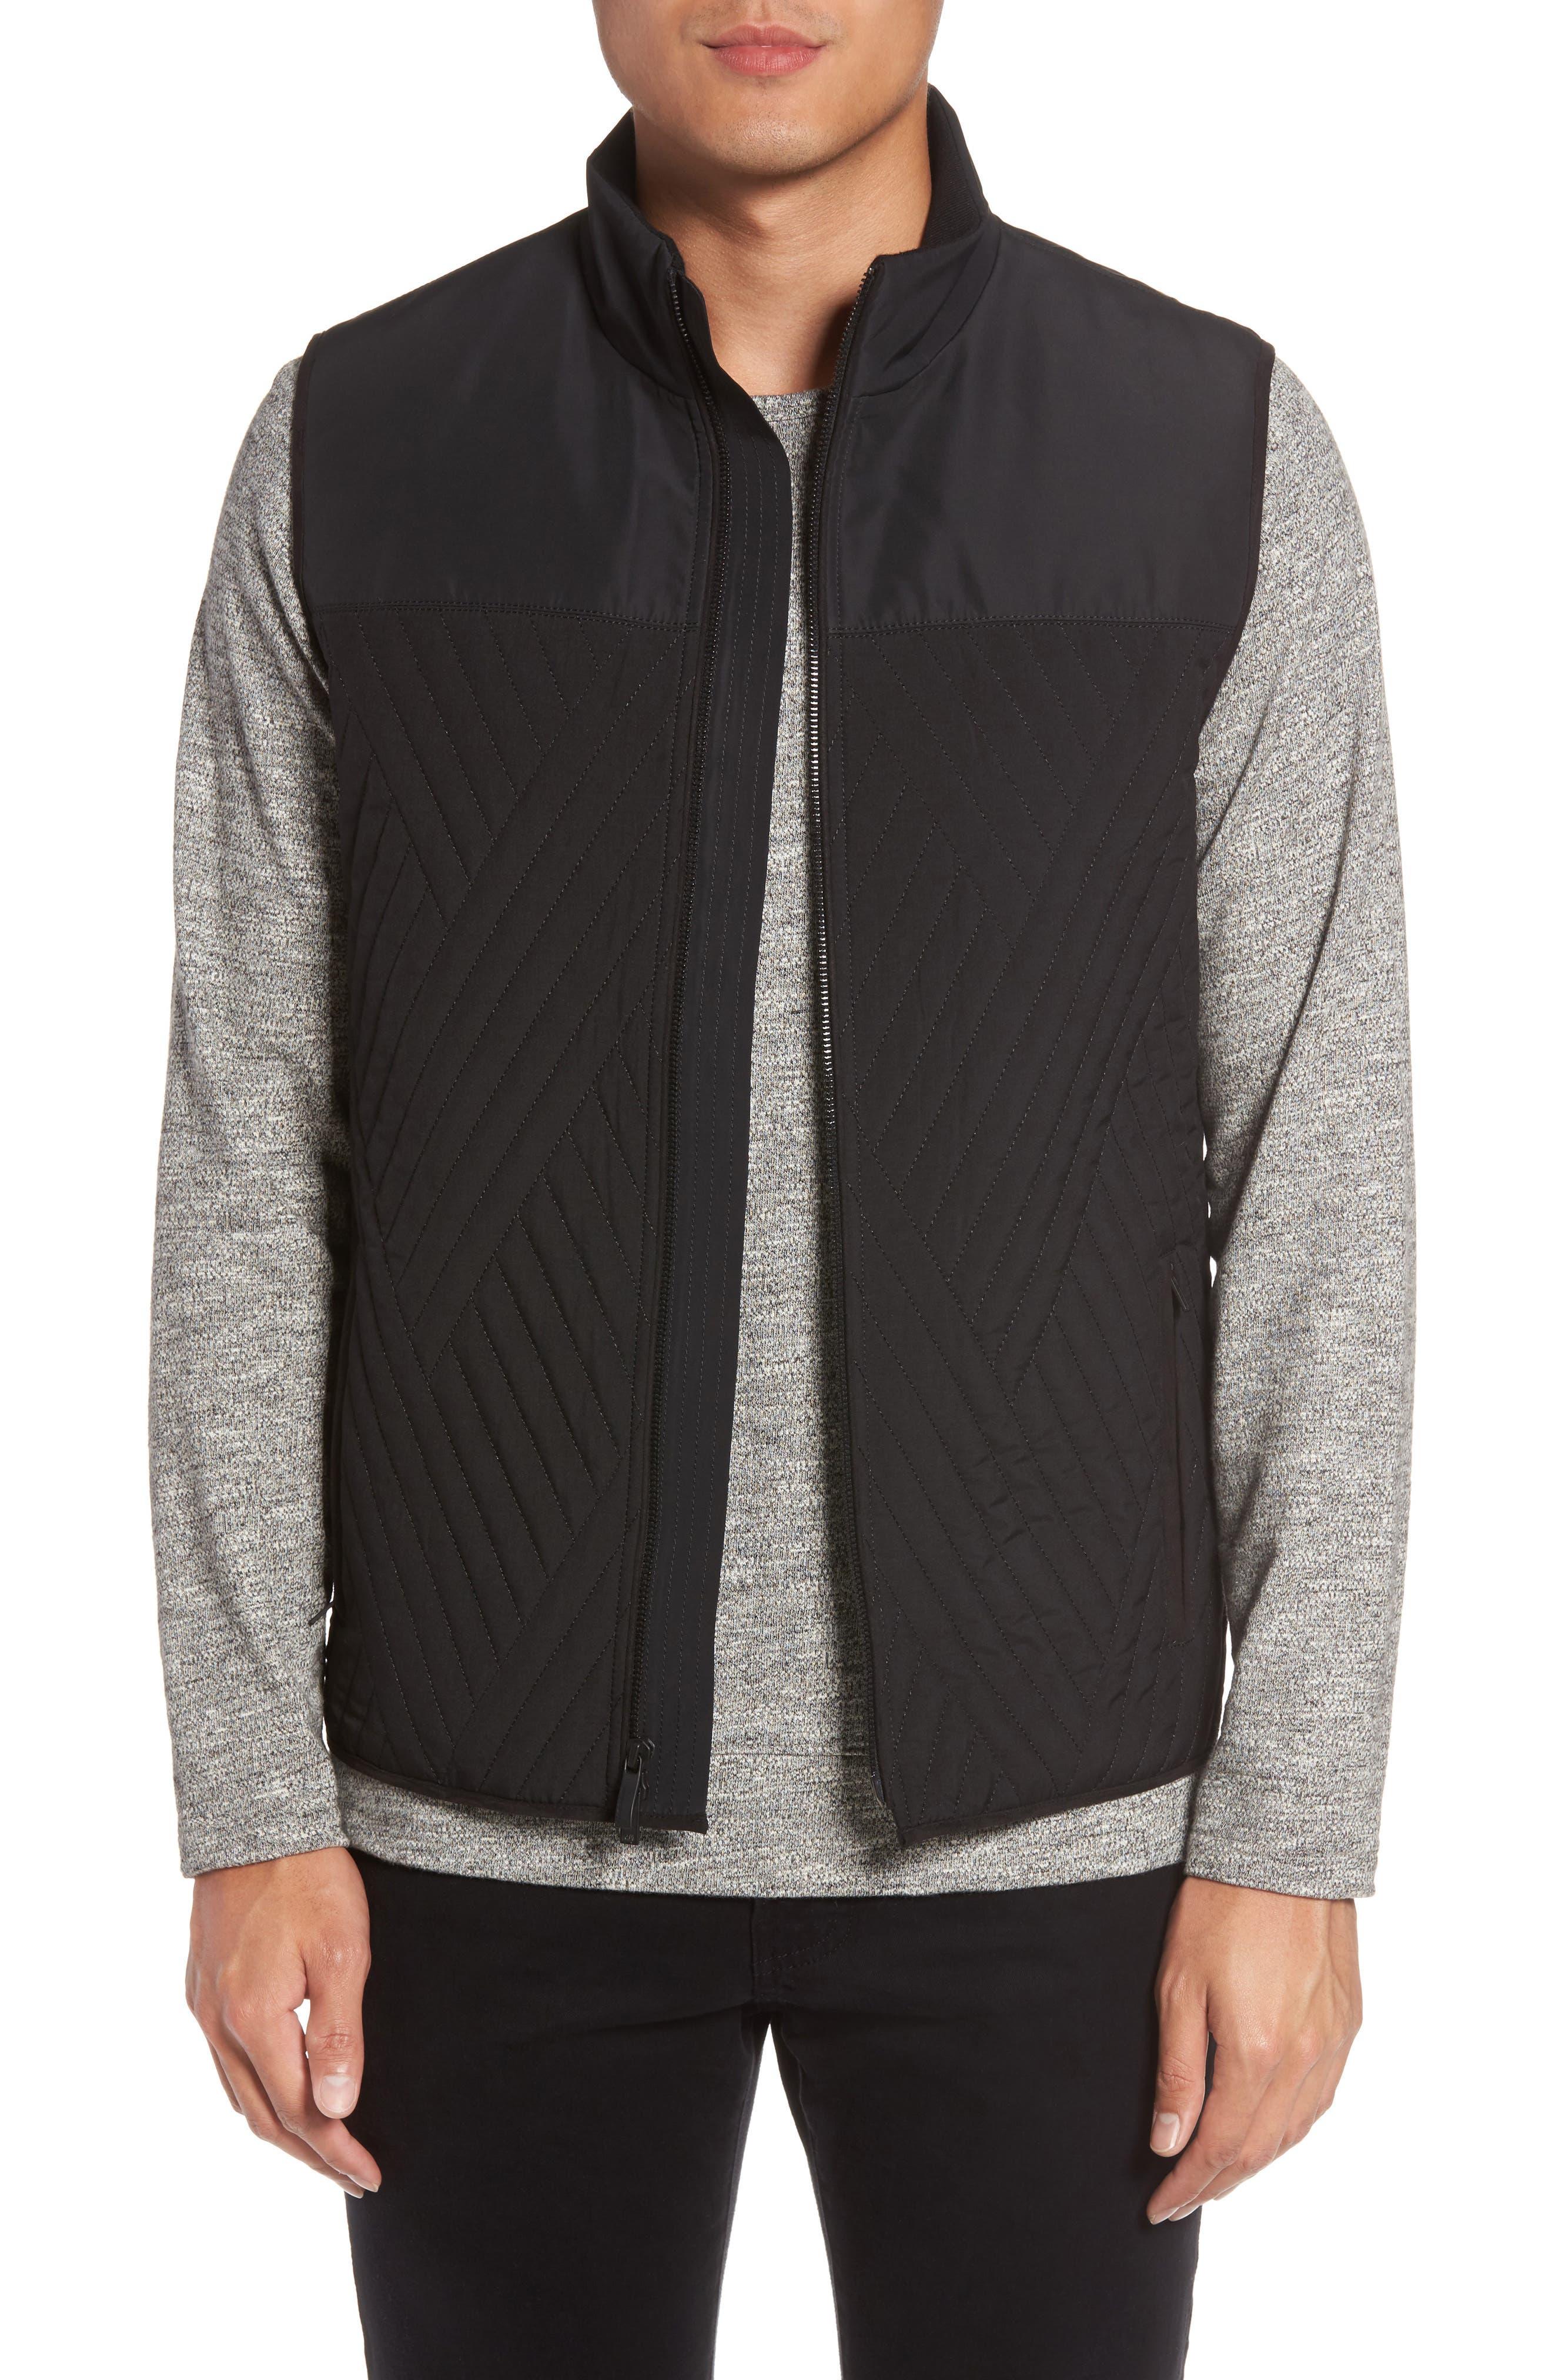 VINCE CAMUTO Slim Fit Quilted Vest, Main, color, BLACK